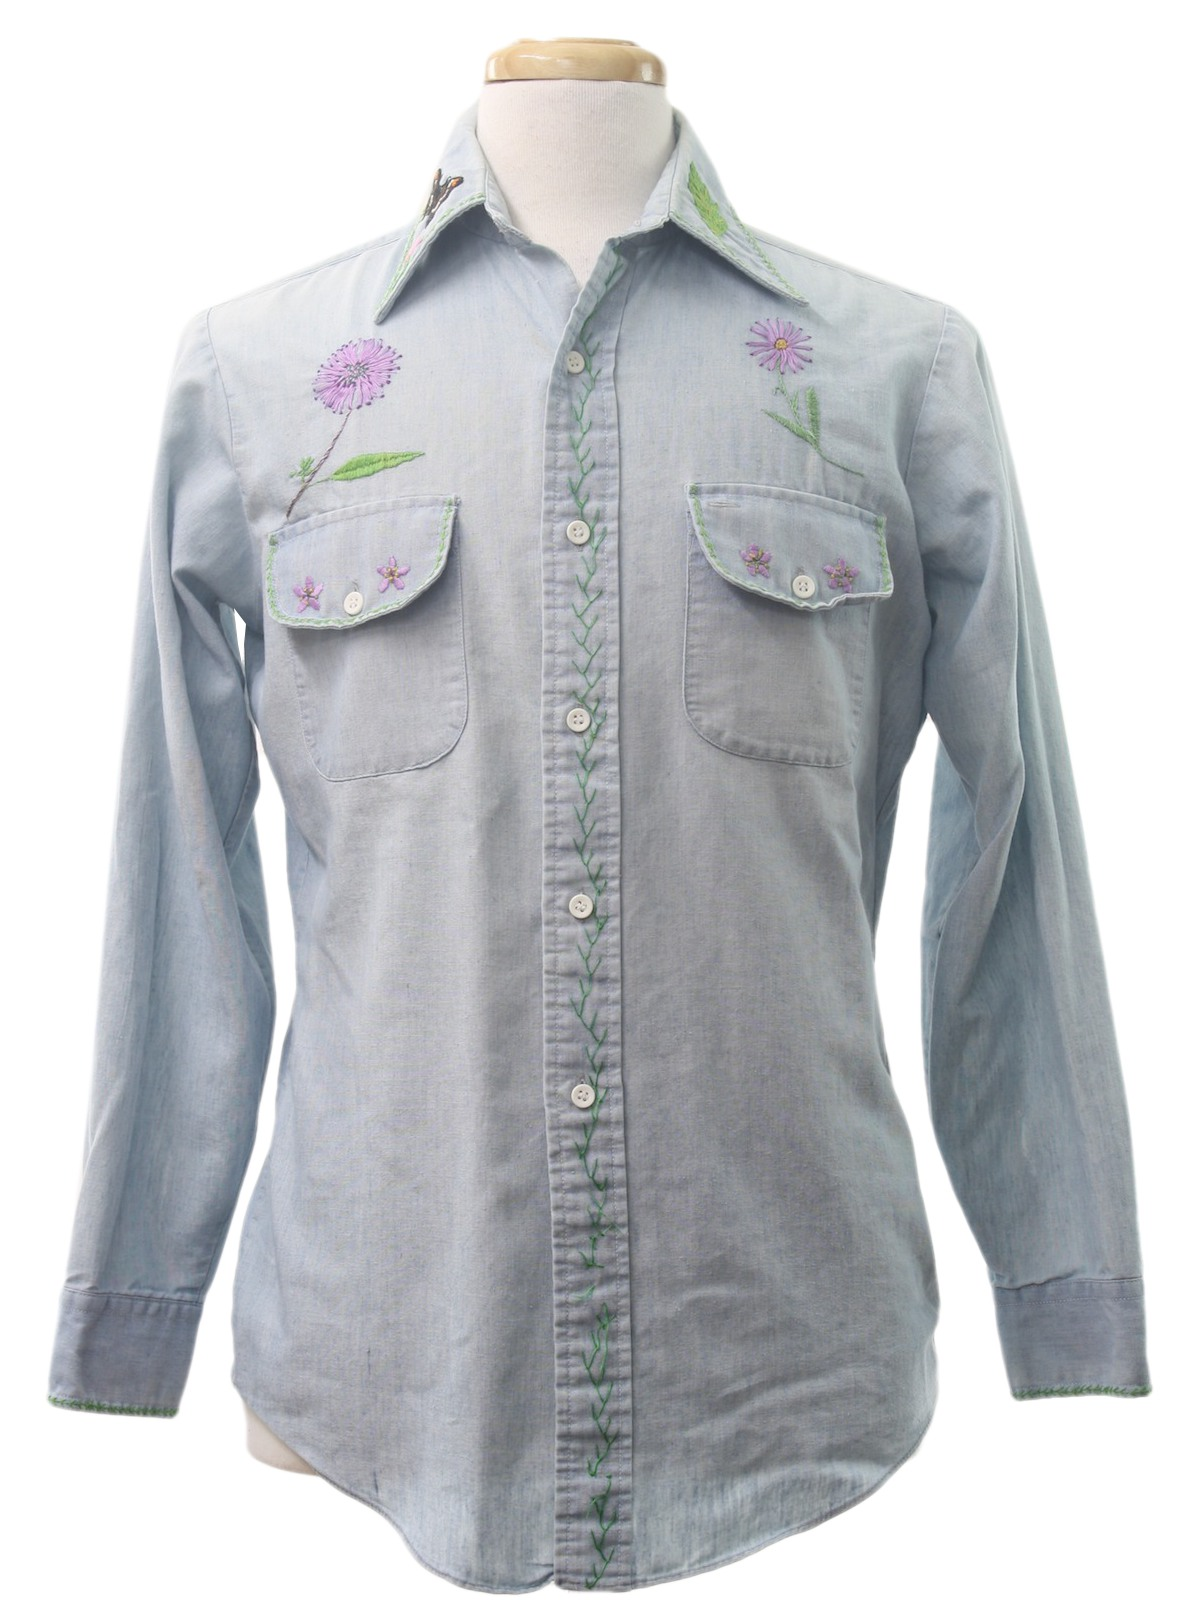 1970s kmart hippie shirt 70s kmart unisex blue for Kmart button up shirts